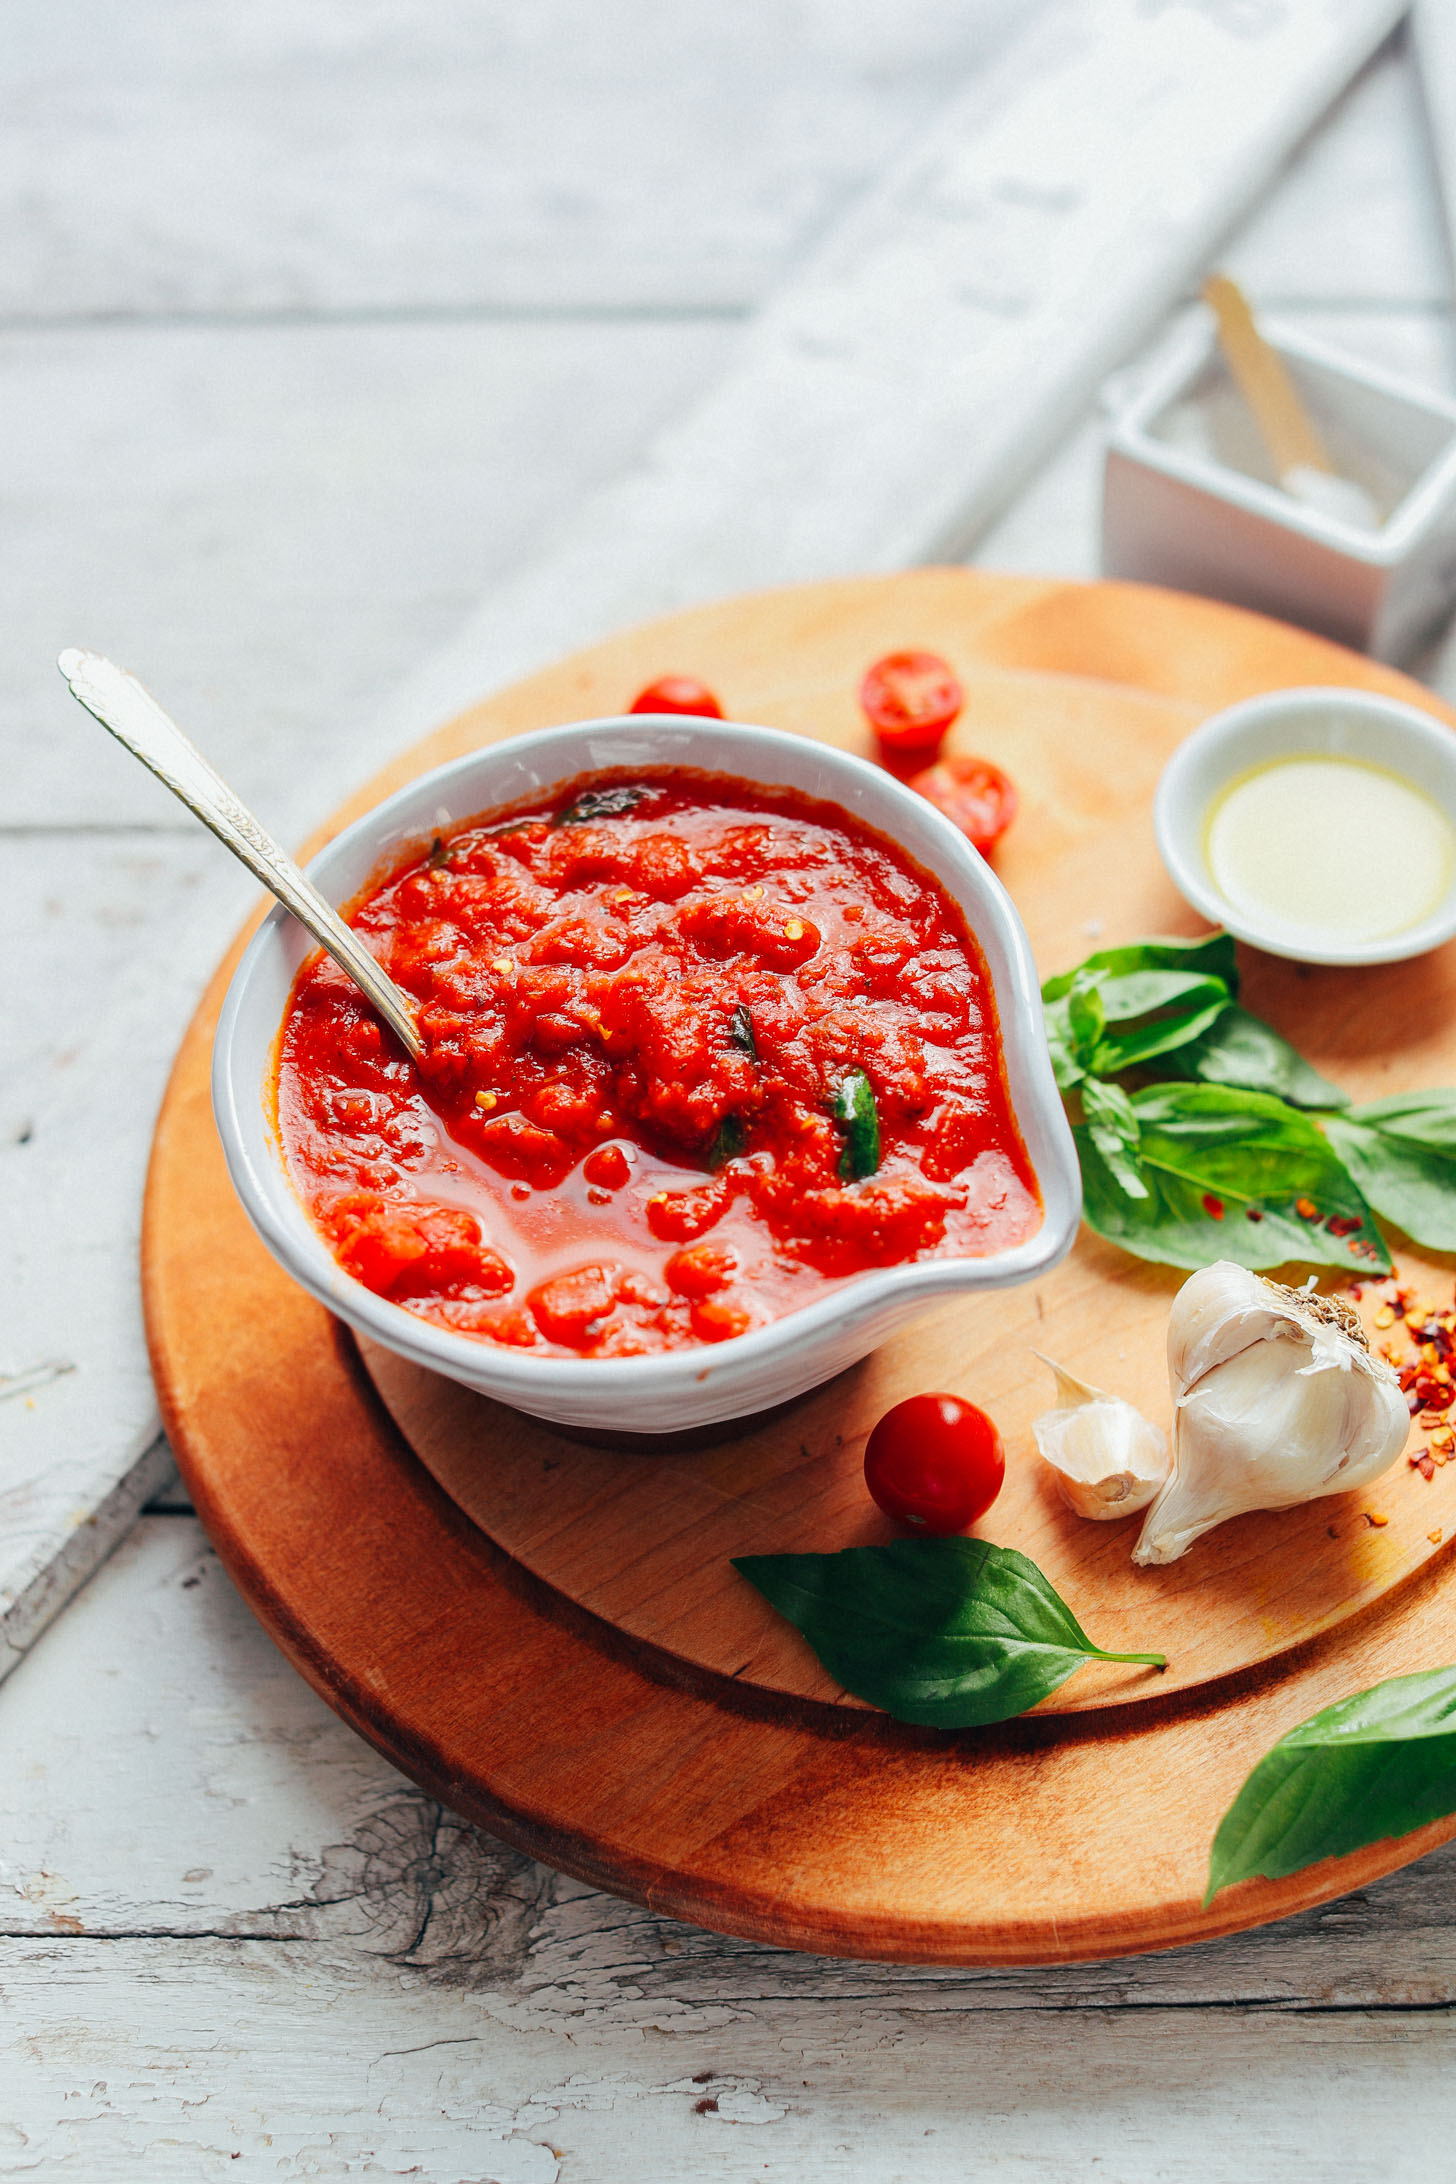 EASY 1-Pot Marinara Sauce! Tomatoey, rich, flavorful, SO delicious! #vegan #plantbased #sauce #glutenfree #tomato #marinara #recipe #minimalistbaker